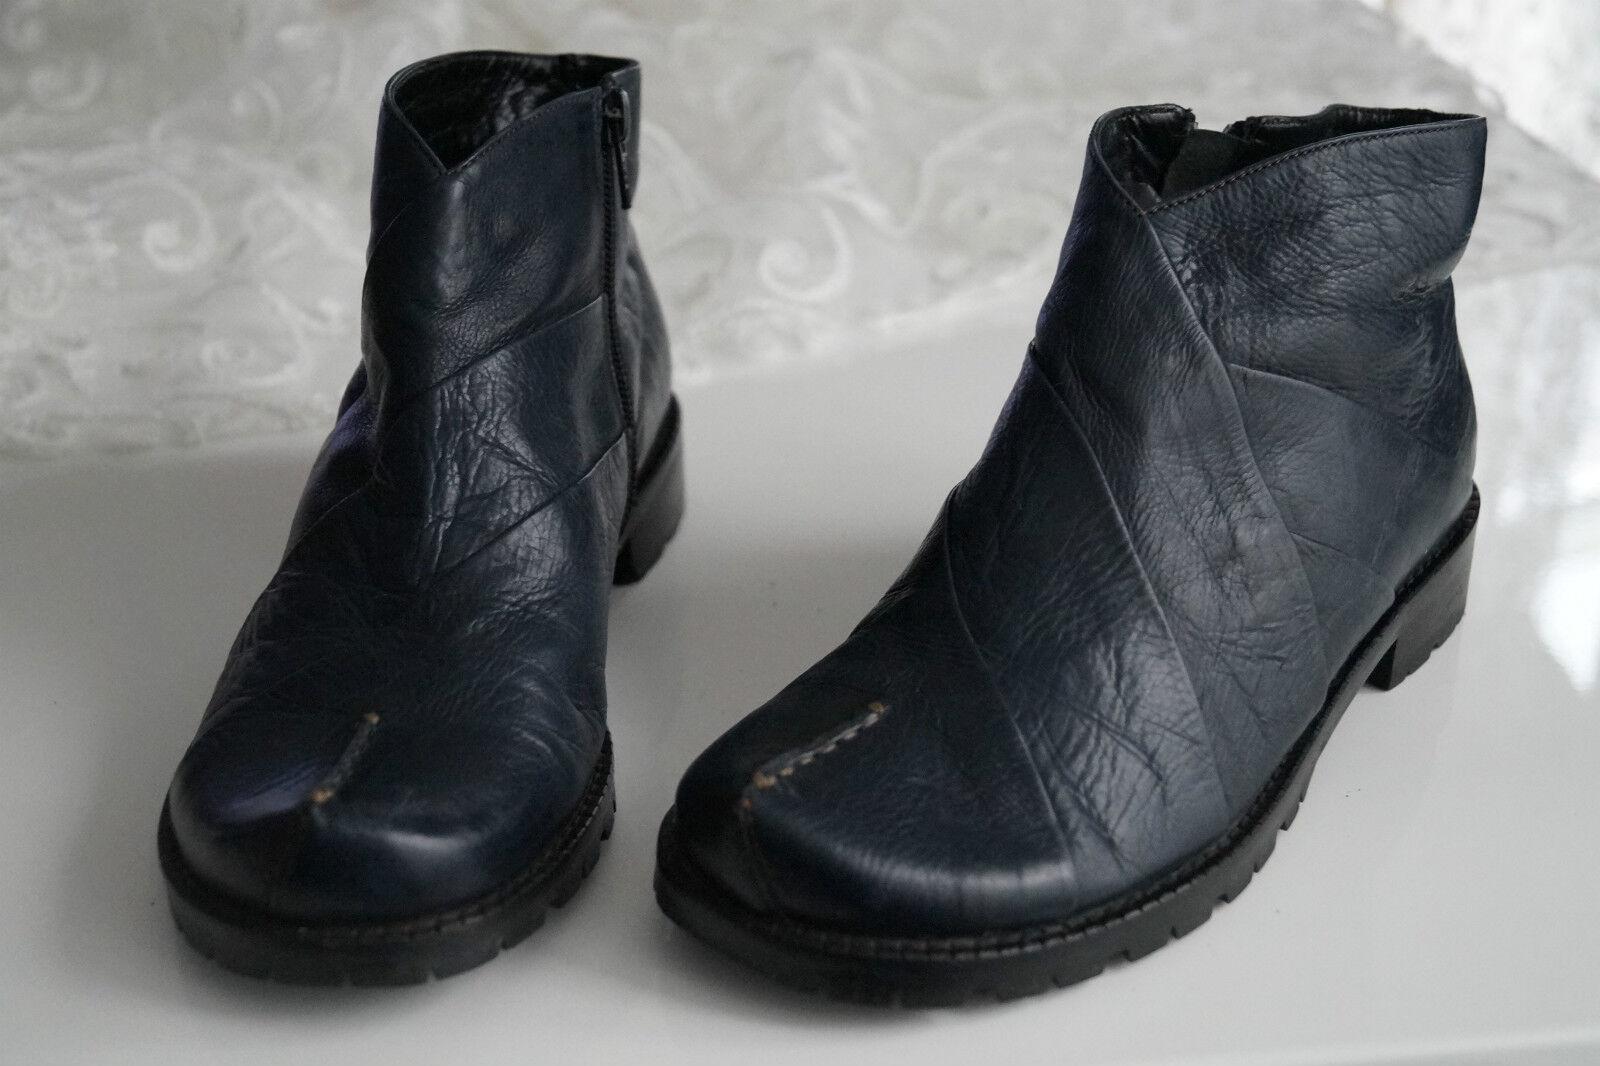 Everybody Everybody Everybody Damen Winter Schuhe Stiefel Stiefeletten Stiefel gefüttert Leder Gr.37 9c31bc